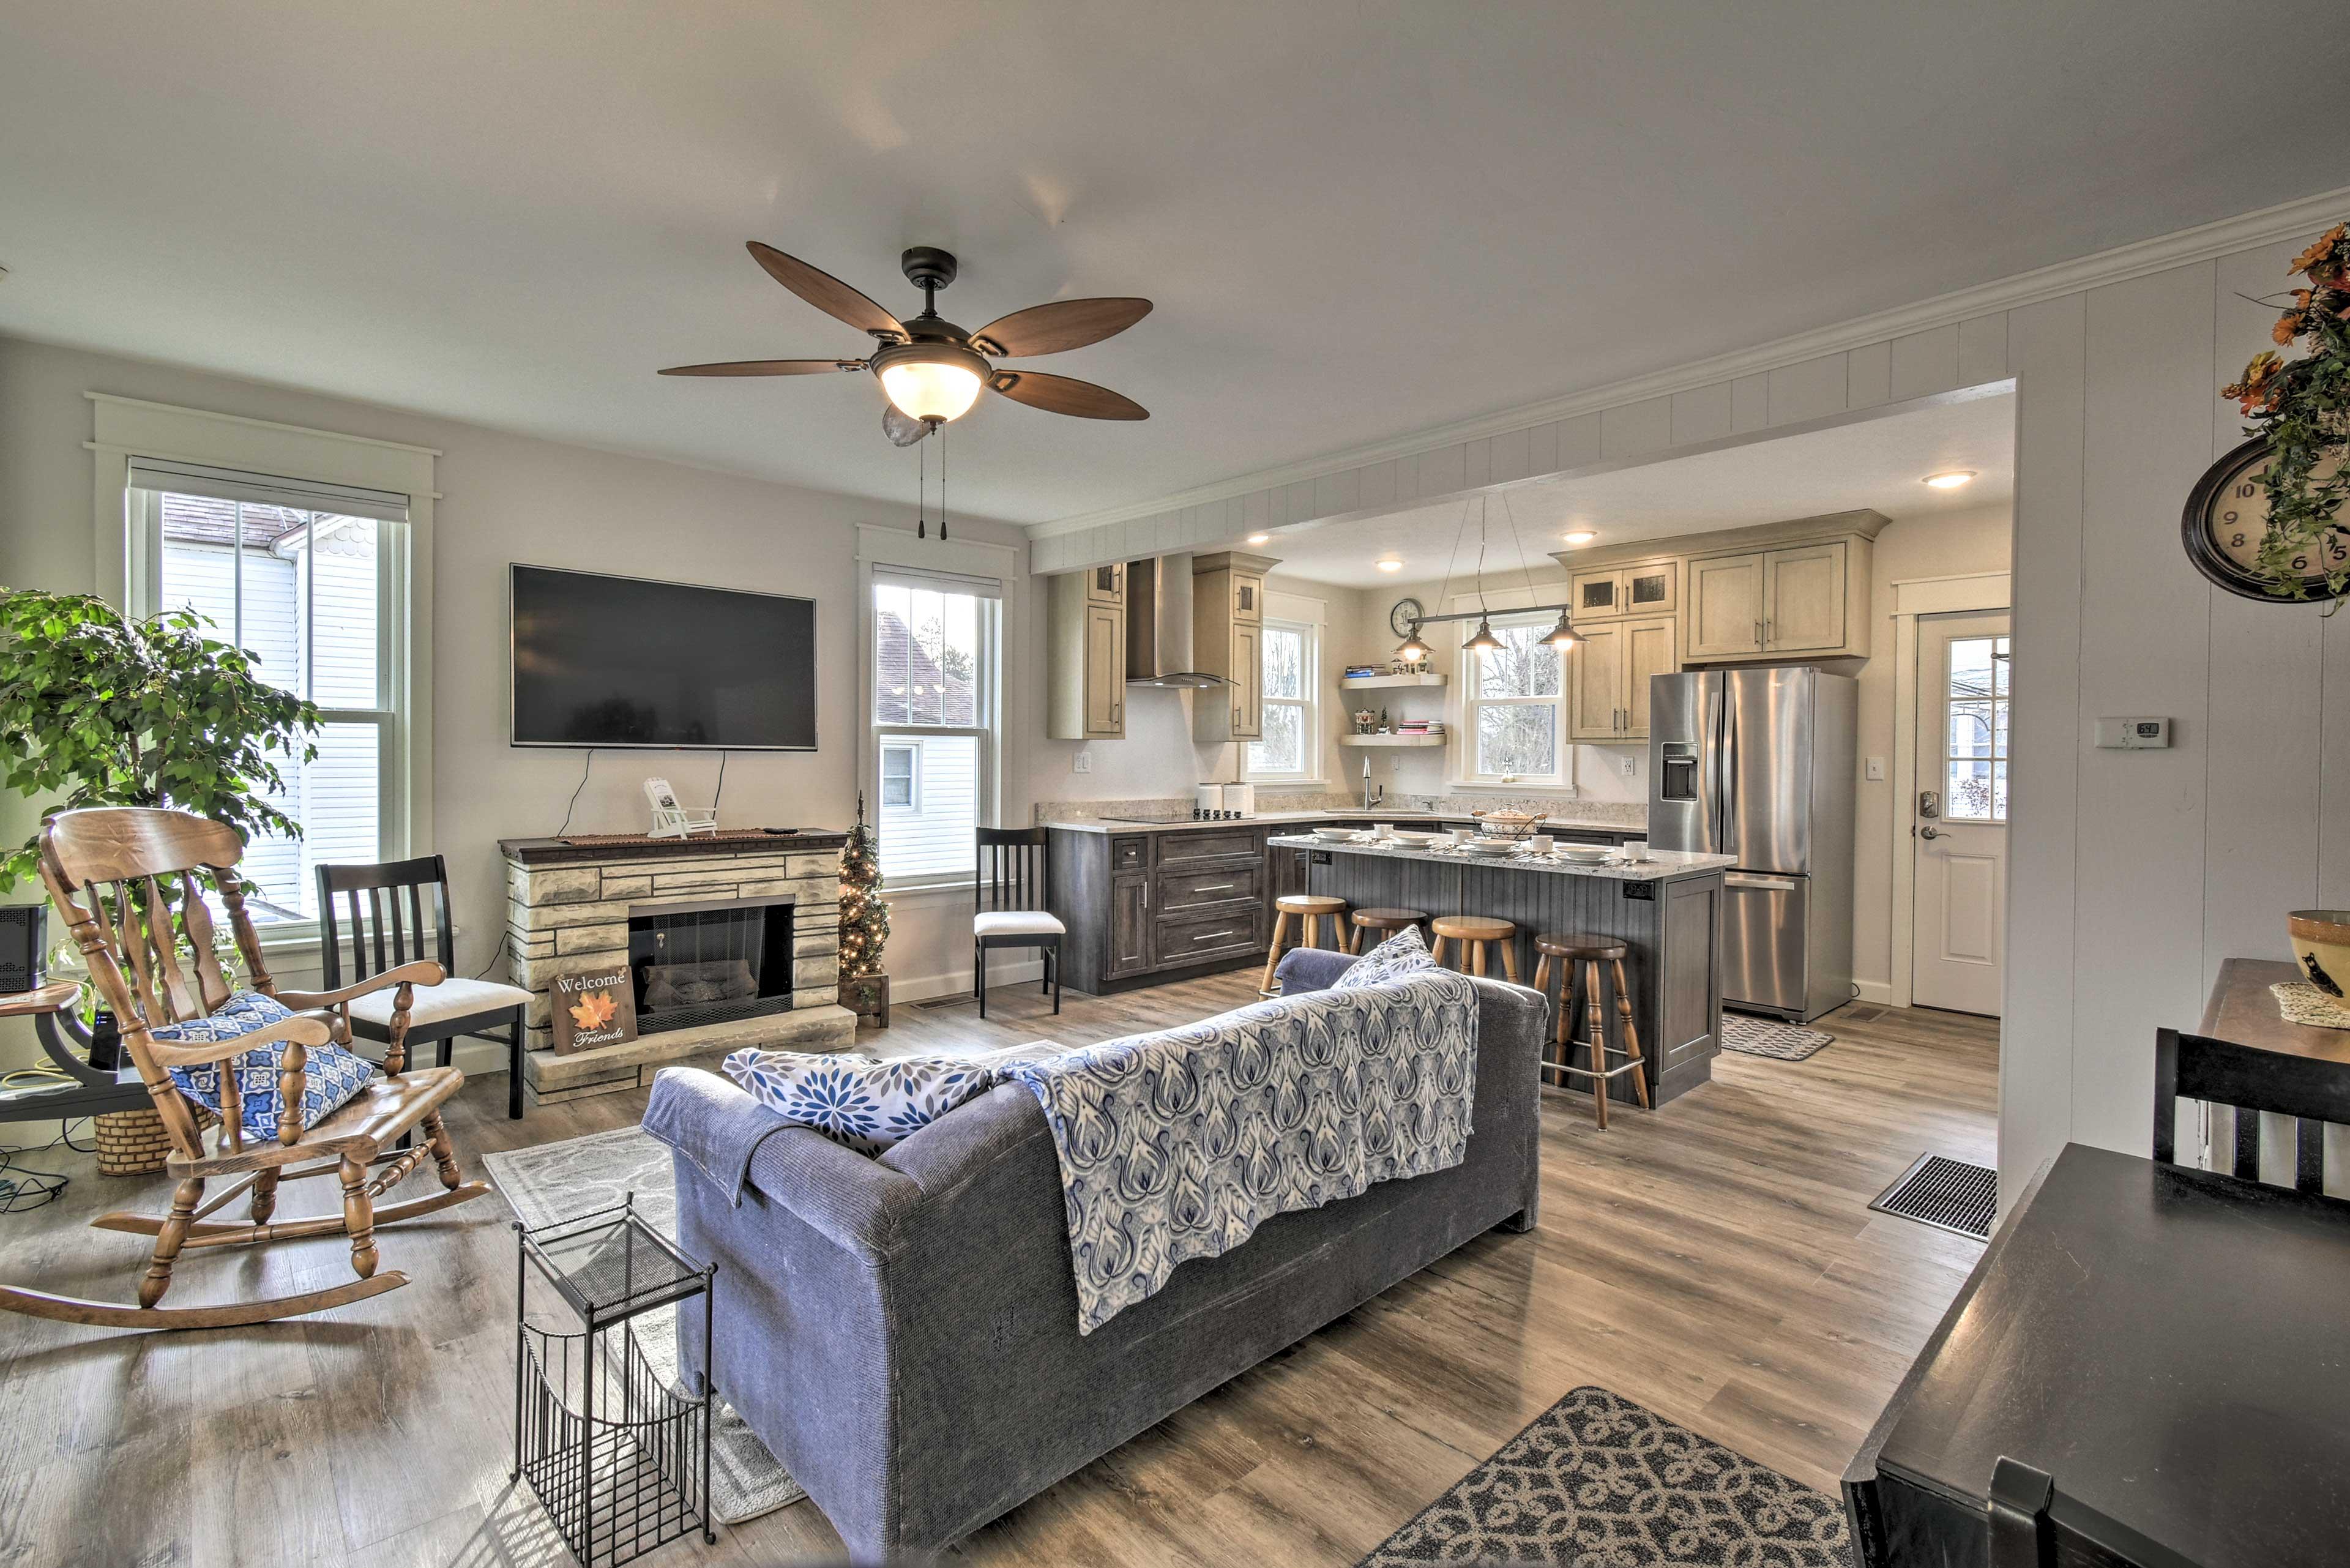 Unwind in this lavish 3-bedroom, 2-bathroom vacation rental home in Green Lake.